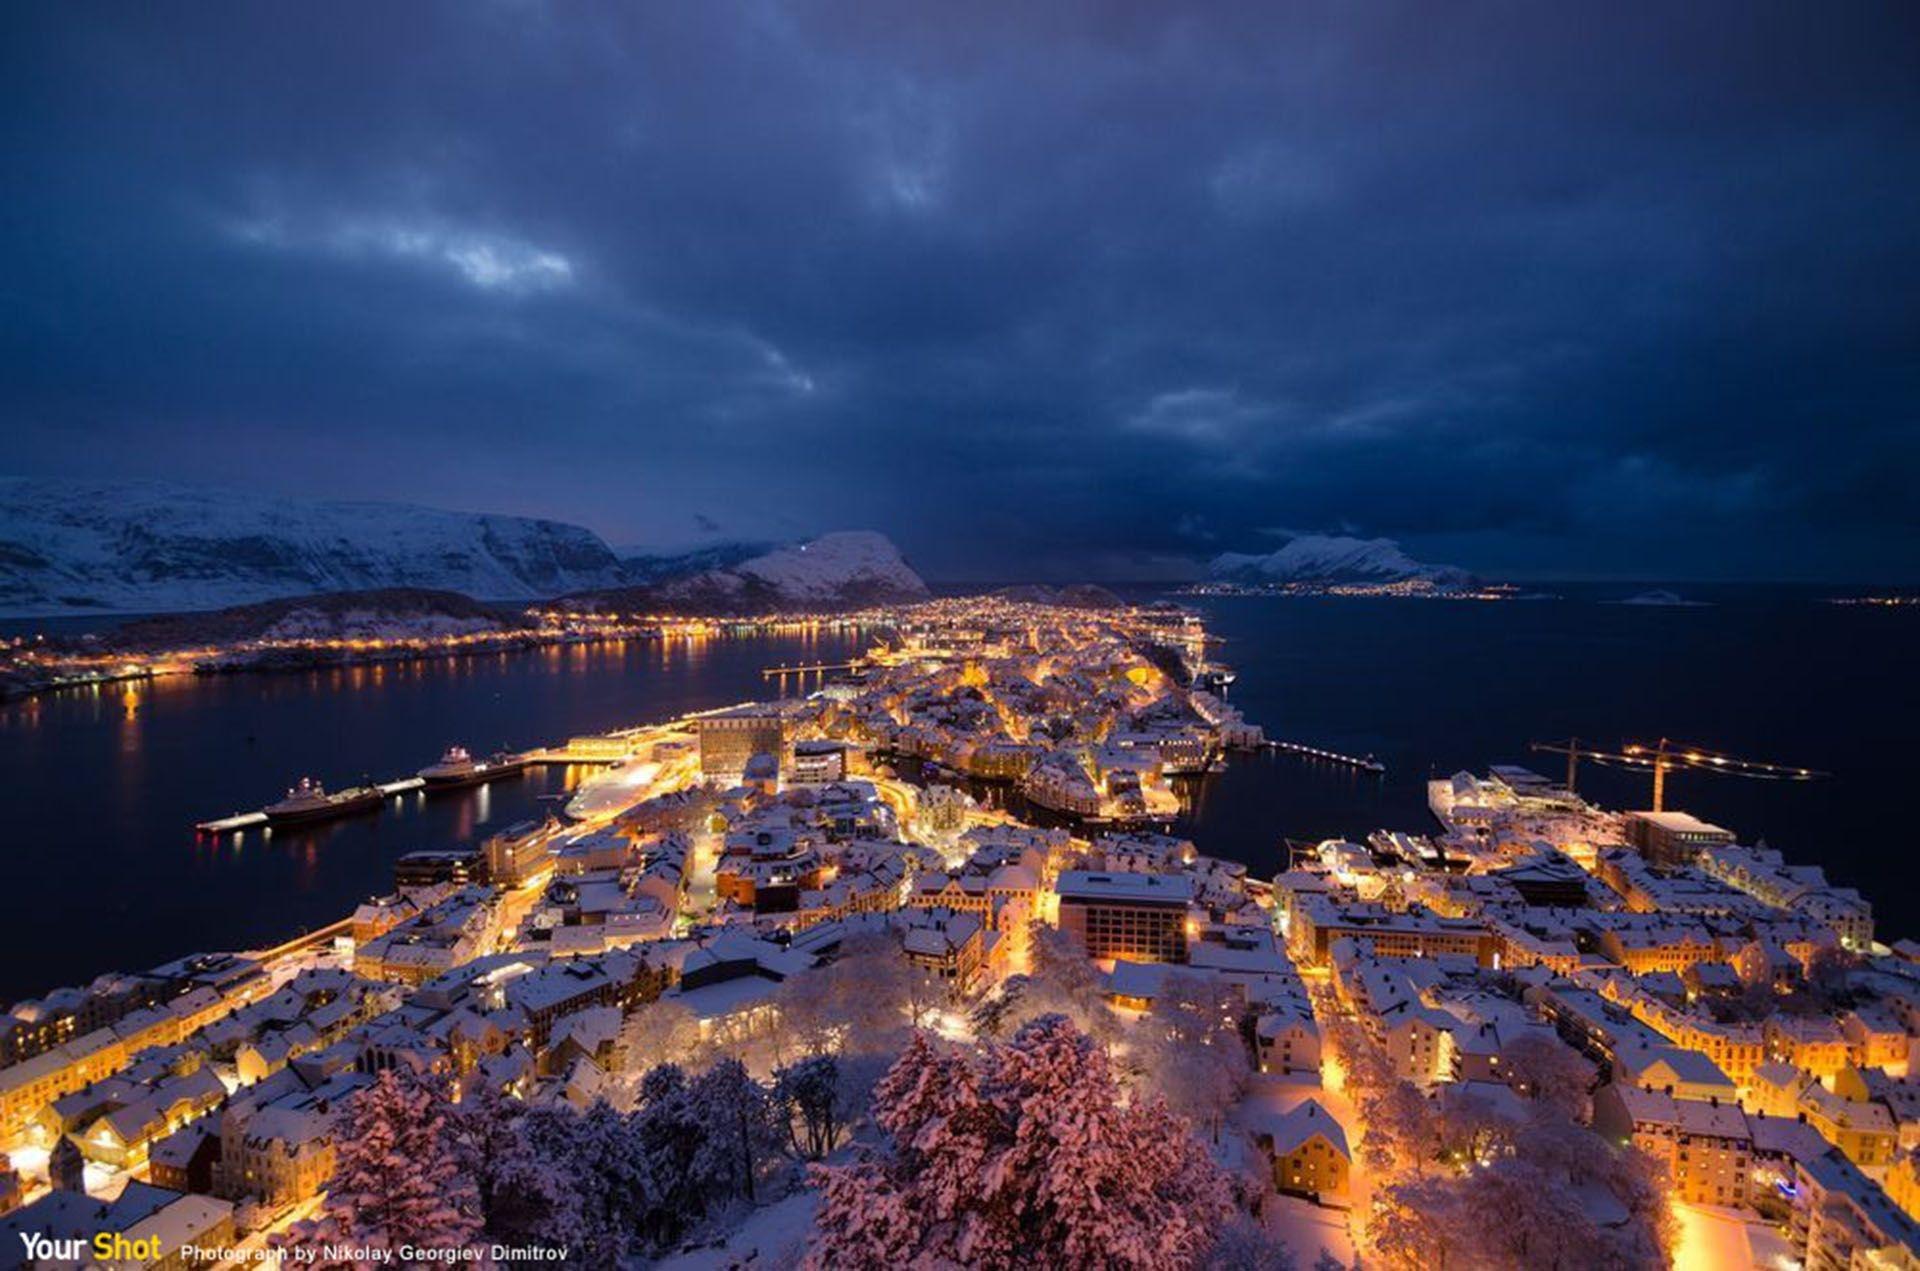 Photograph by Nikolay Georgiev Dimitrov, National Geographic